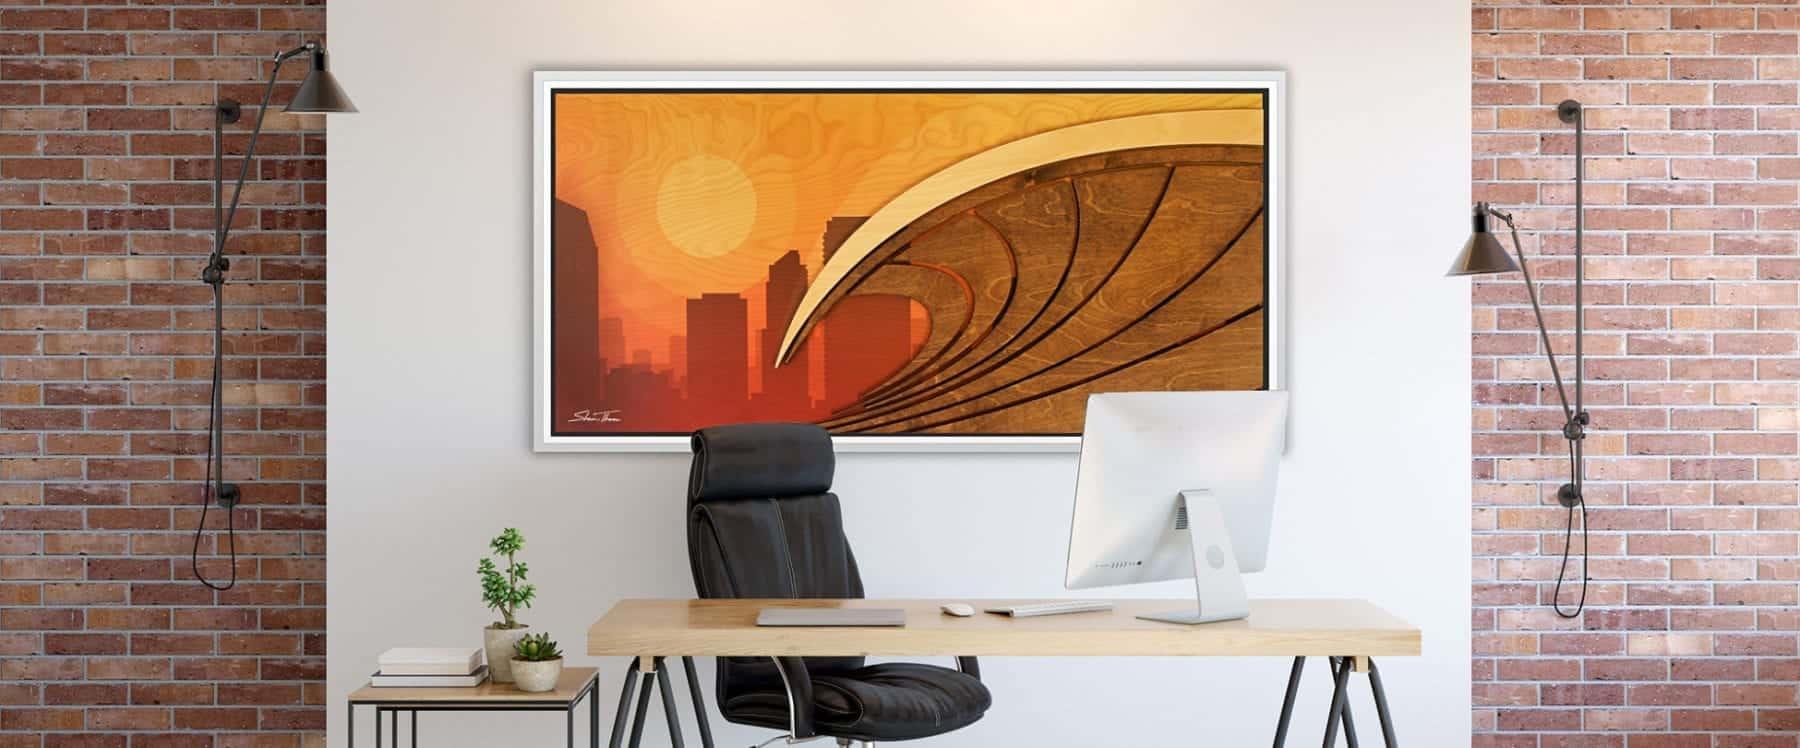 Surf City California Artwork - Floating Frame Wood Beach Wall Art - ocean gallery